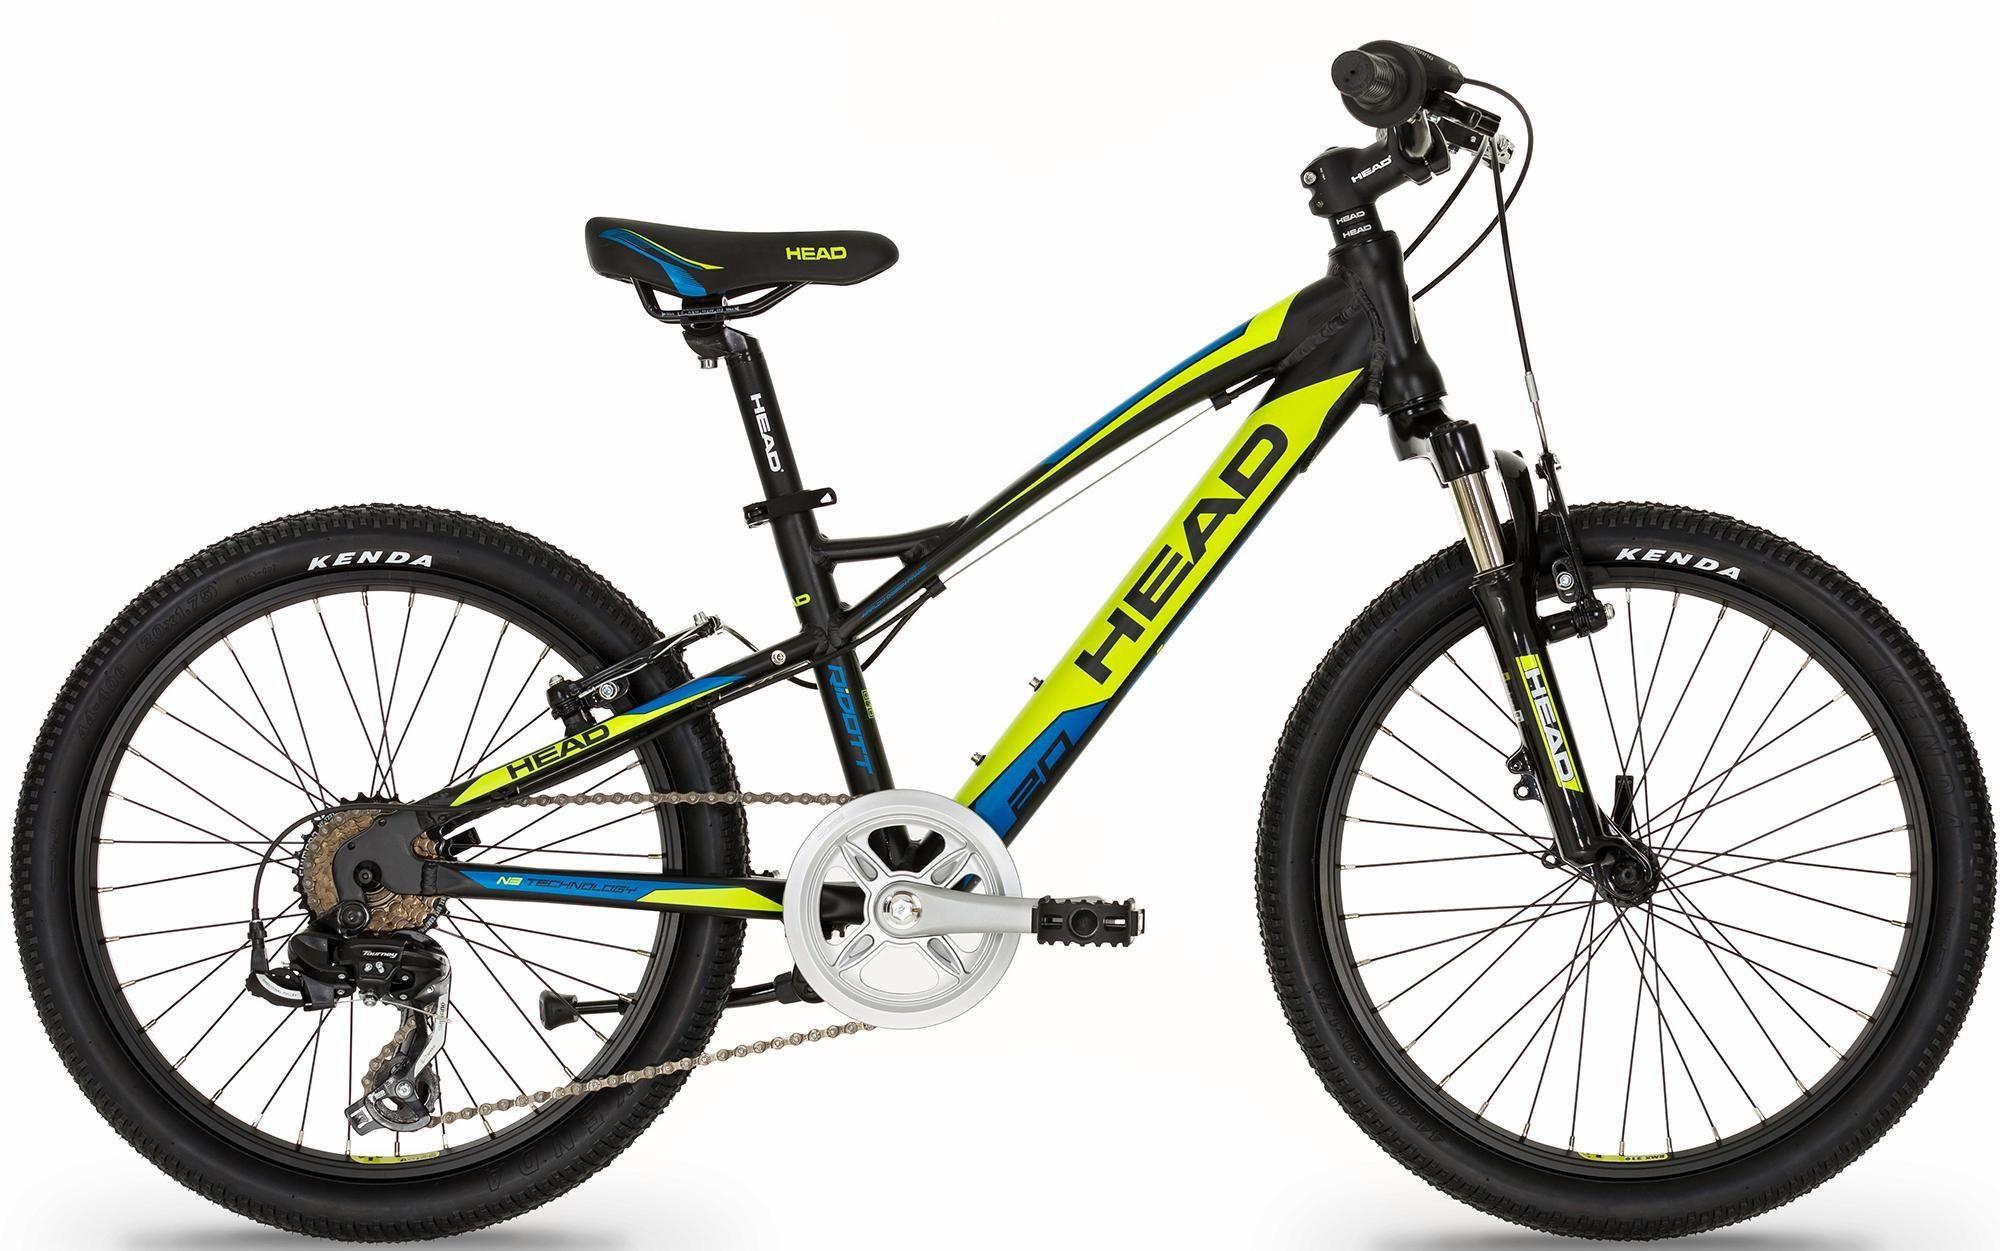 Head Mountainbike »Ridott II«, 7 Gang Shimano Shimano TY500 Schaltwerk, Kettenschaltung